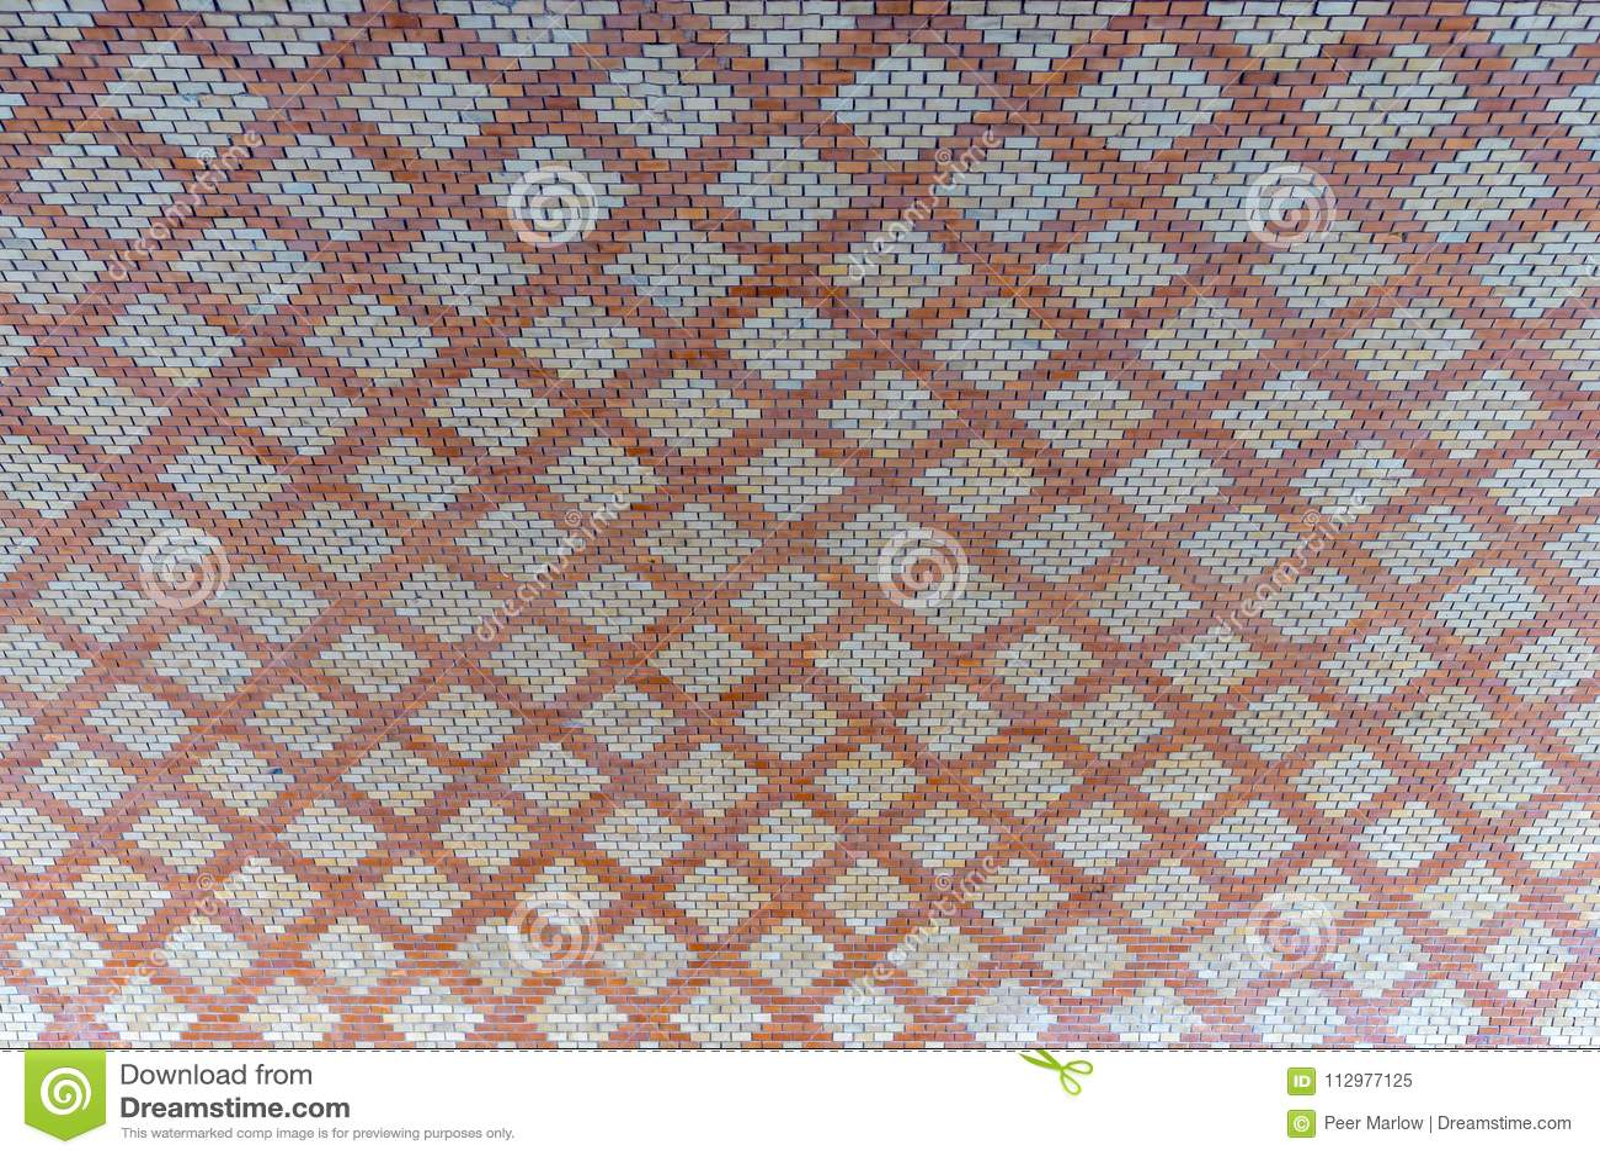 Brick pattern under the Theodor Heuss Bridge in Mainz City. Rhineland Palatinate Germany.